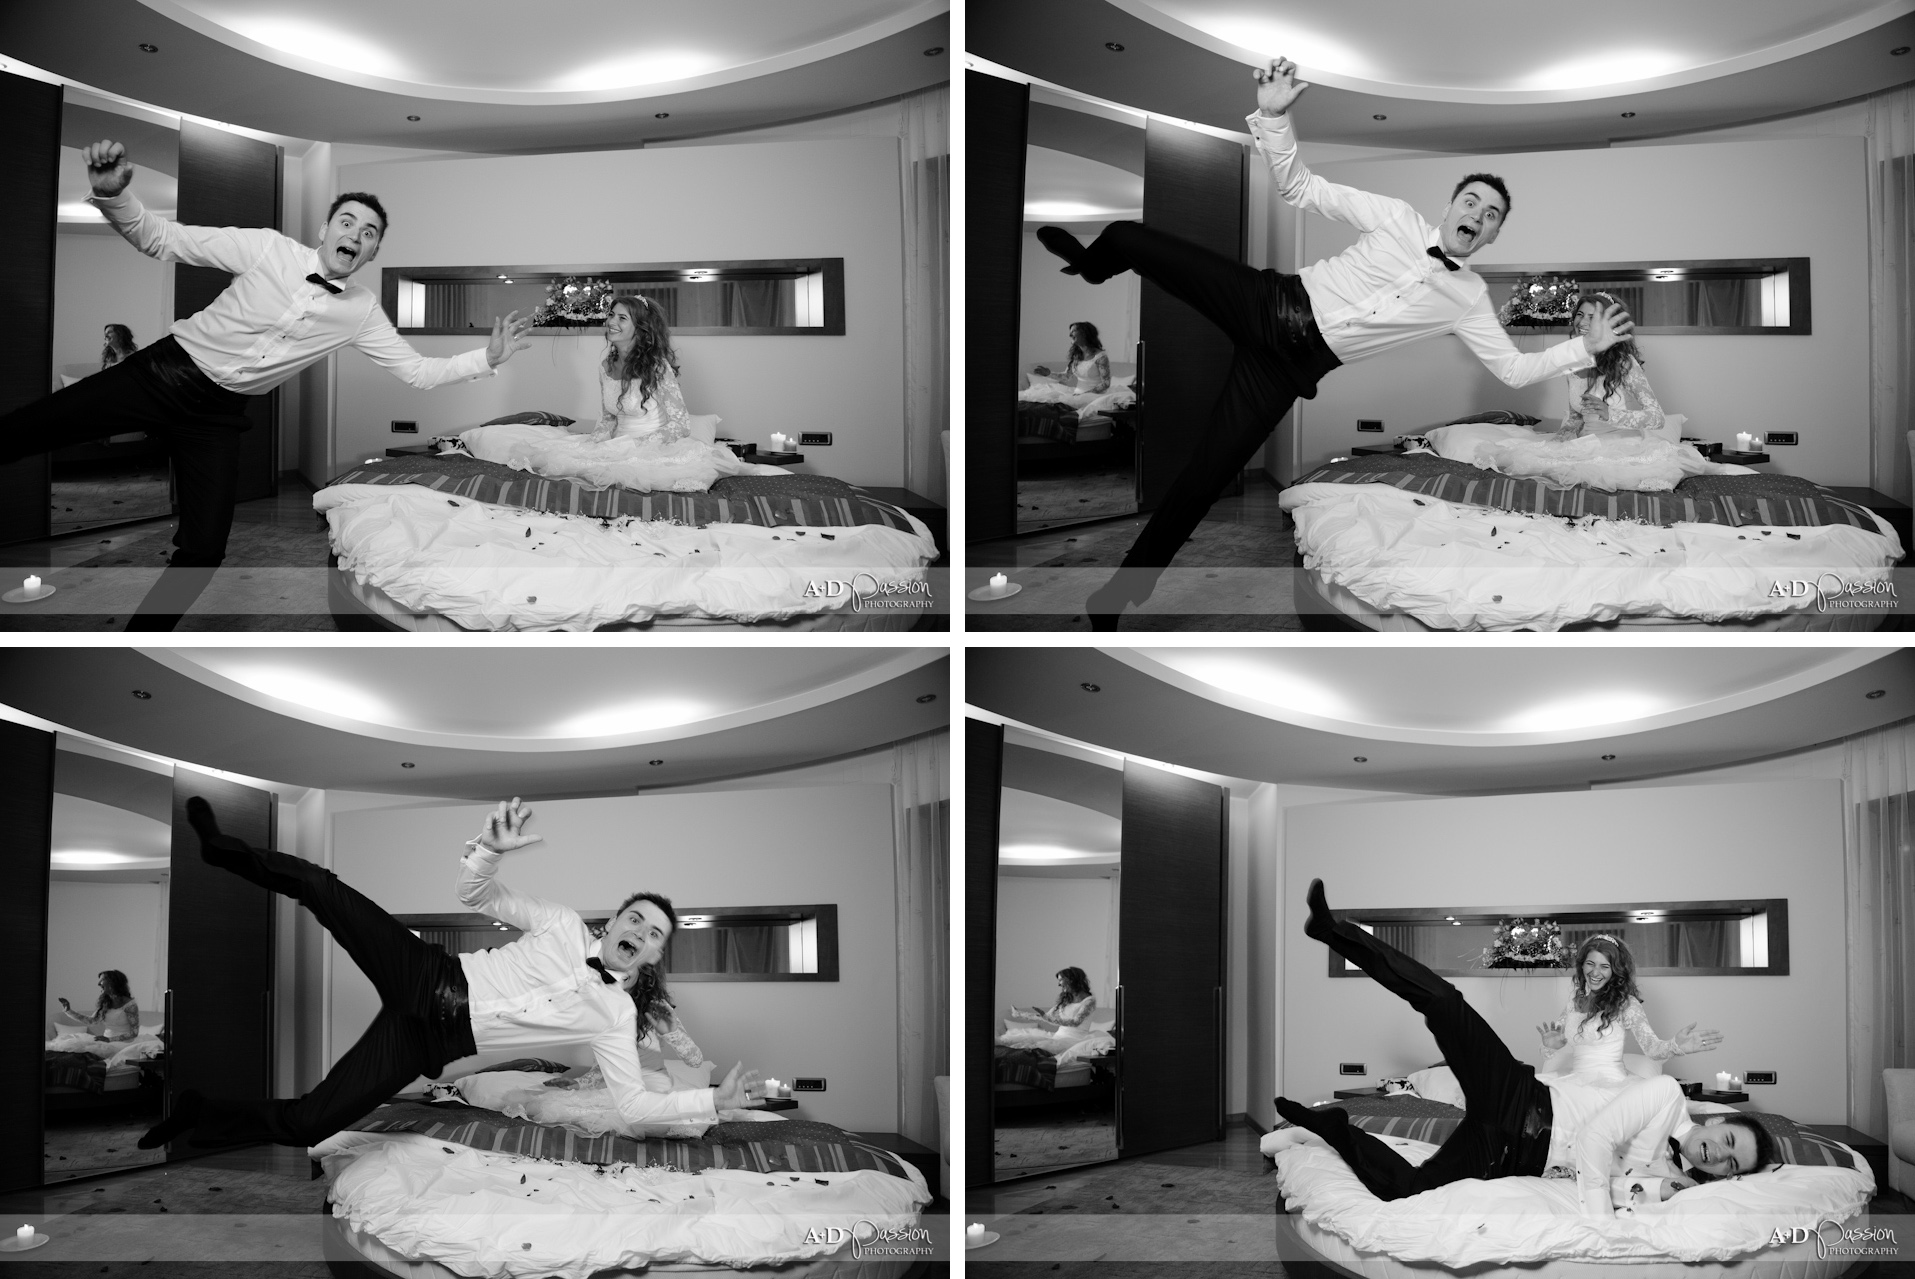 AD Passion Photography | 06282012_fotograf_profesionist_nunta_timisoara_tabitha-si-darius_0085 | Adelin, Dida, fotograf profesionist, fotograf de nunta, fotografie de nunta, fotograf Timisoara, fotograf Craiova, fotograf Bucuresti, fotograf Arad, nunta Timisoara, nunta Arad, nunta Bucuresti, nunta Craiova